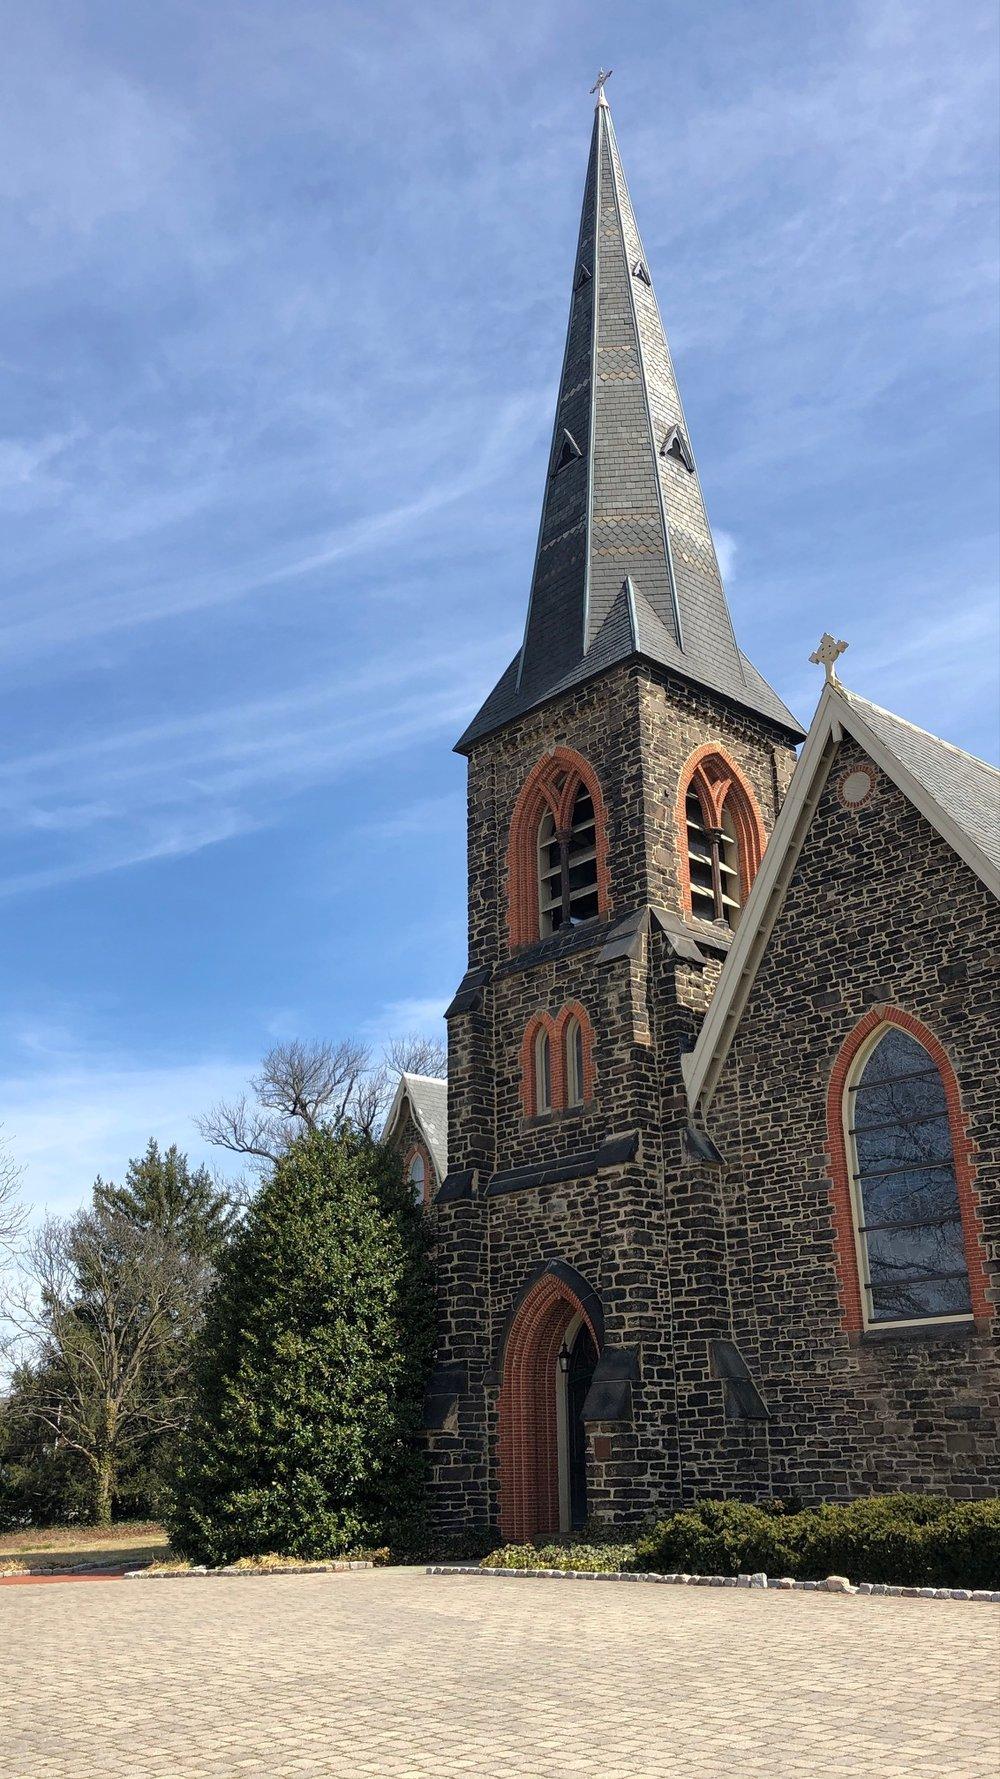 St. John's Episcopal Church, Waverly